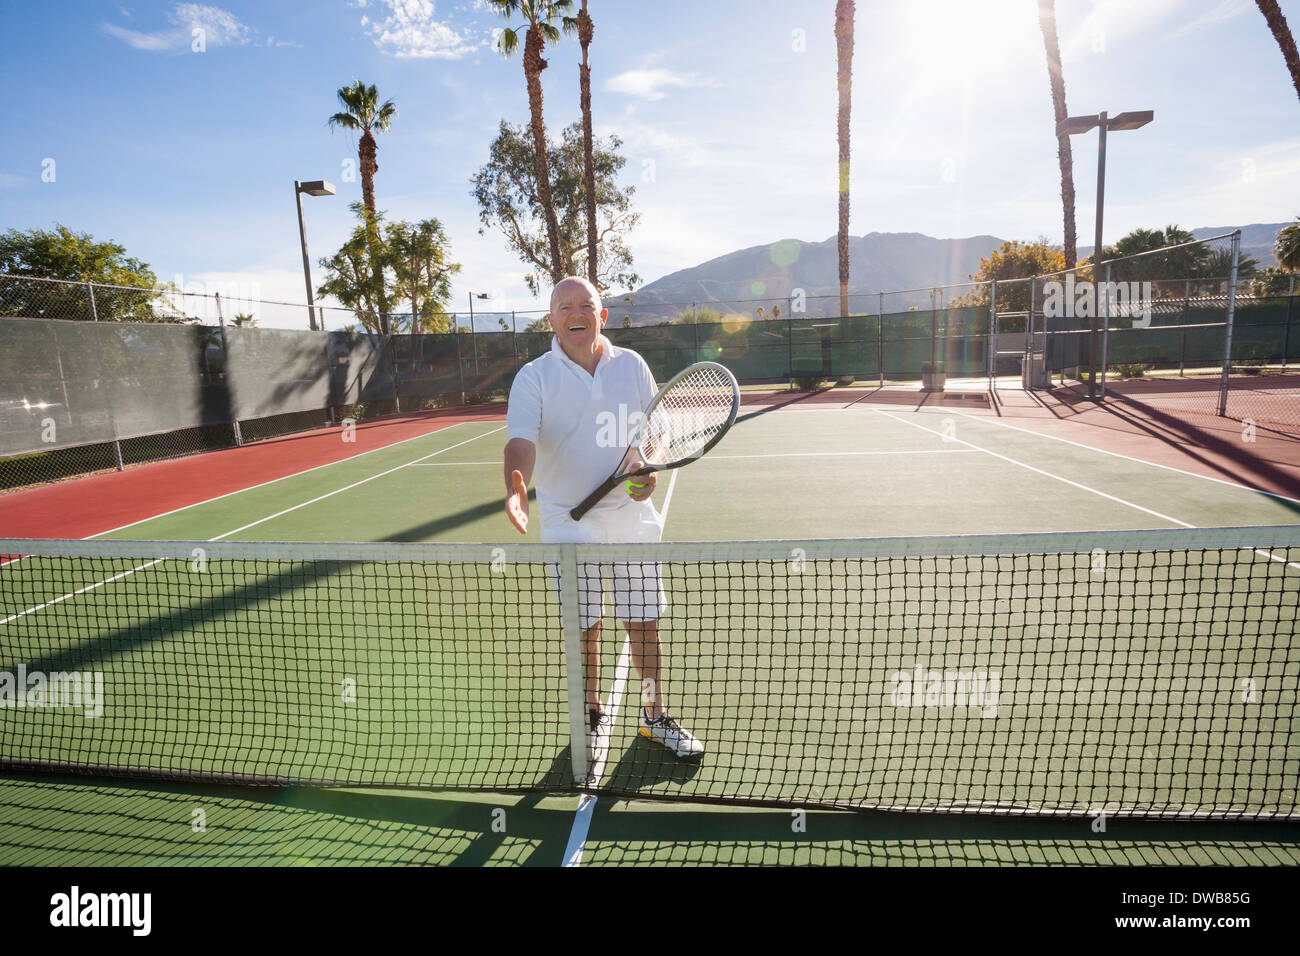 Portrait of senior tennis player offering handshake on court - Stock Image